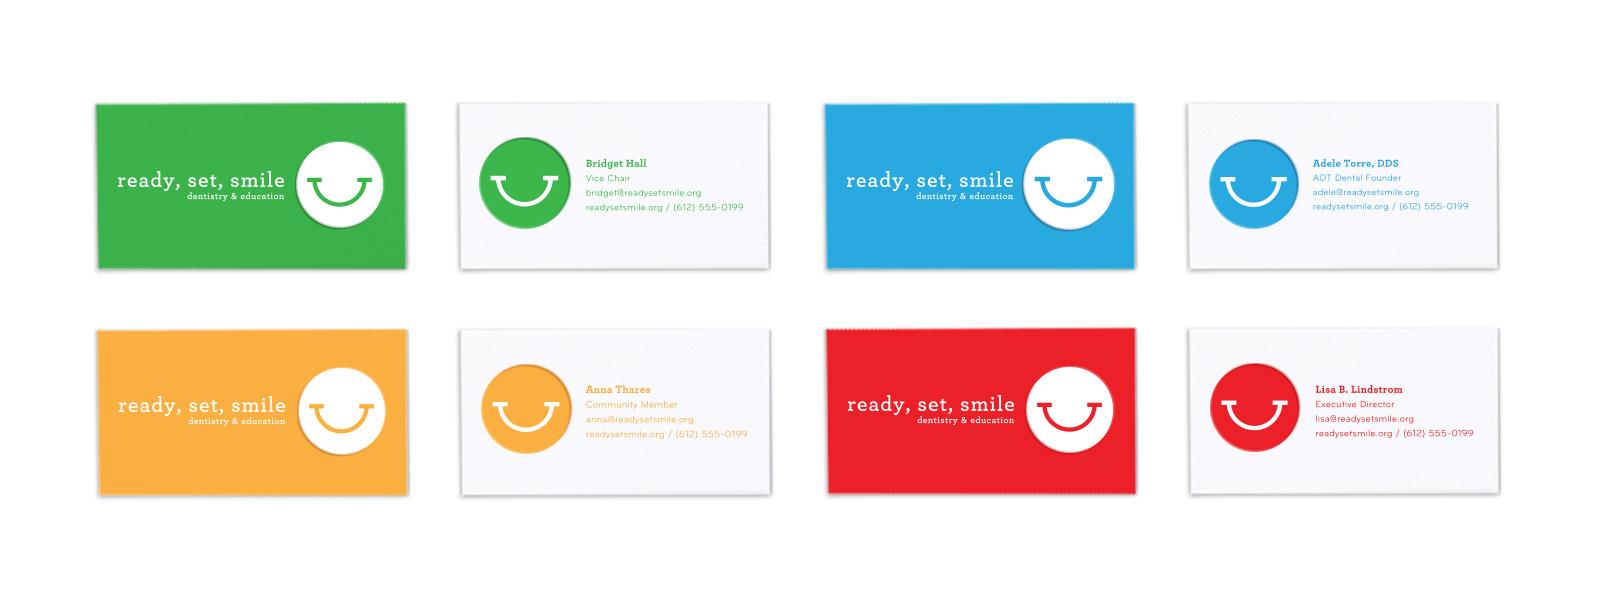 Ready, Set, Smile | Wink